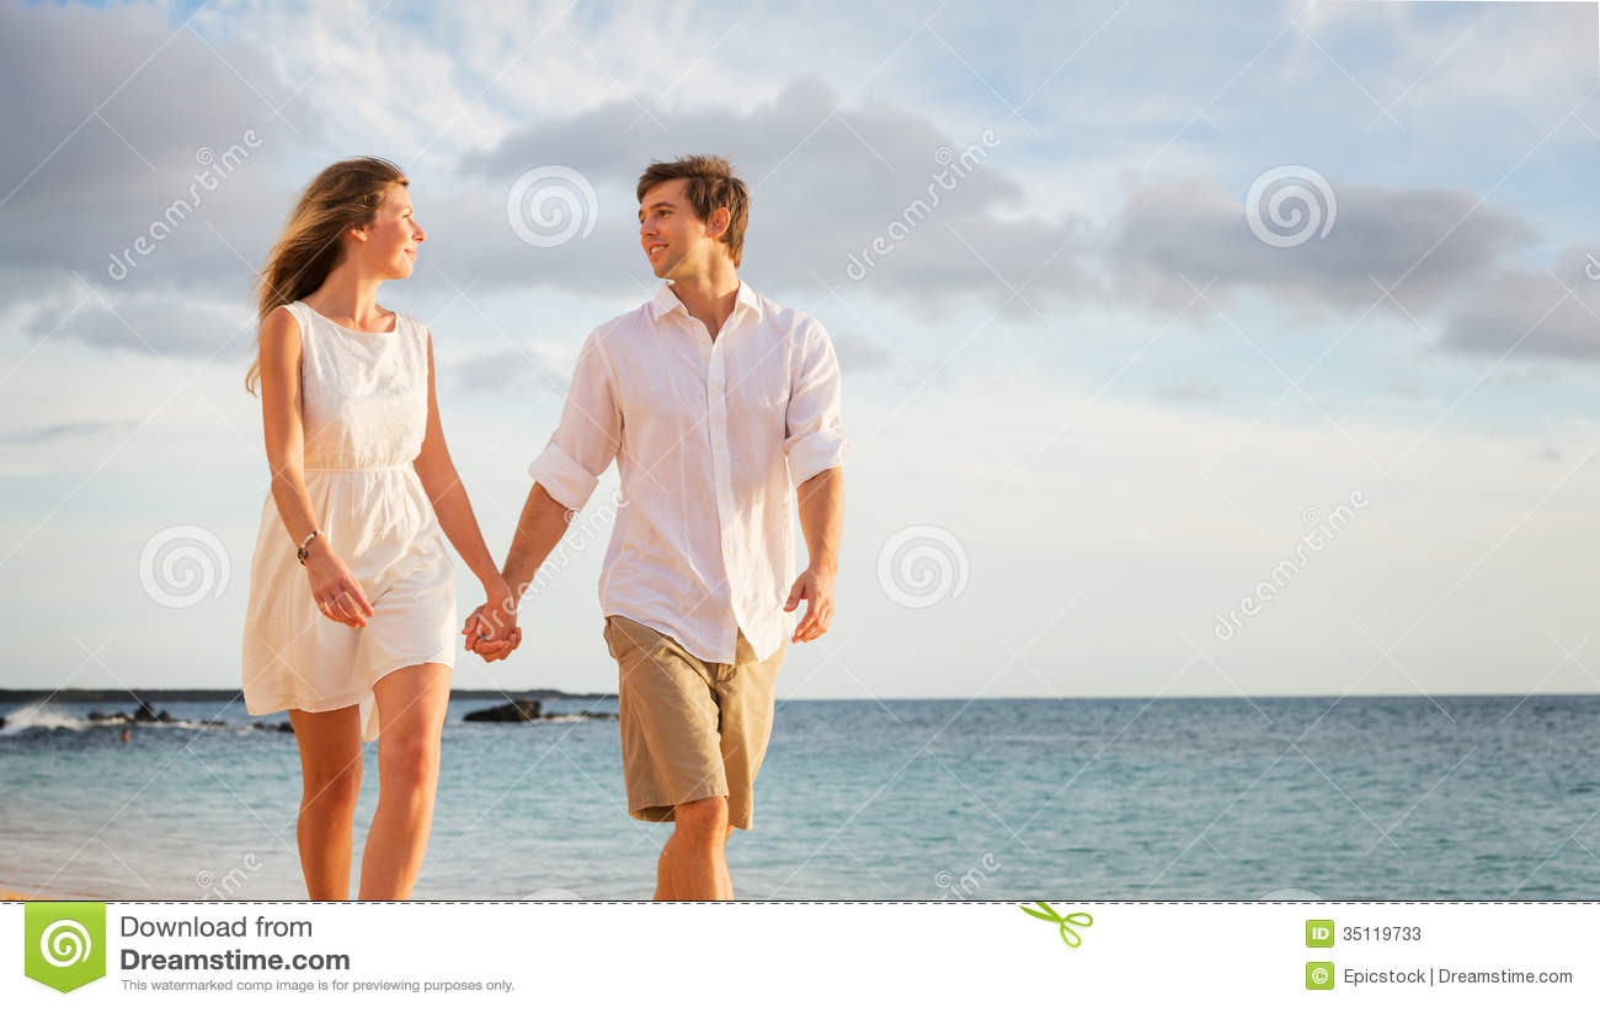 Stock Photos Romantic Happy Couple Walking Beach Sunset Smiling Holdin...